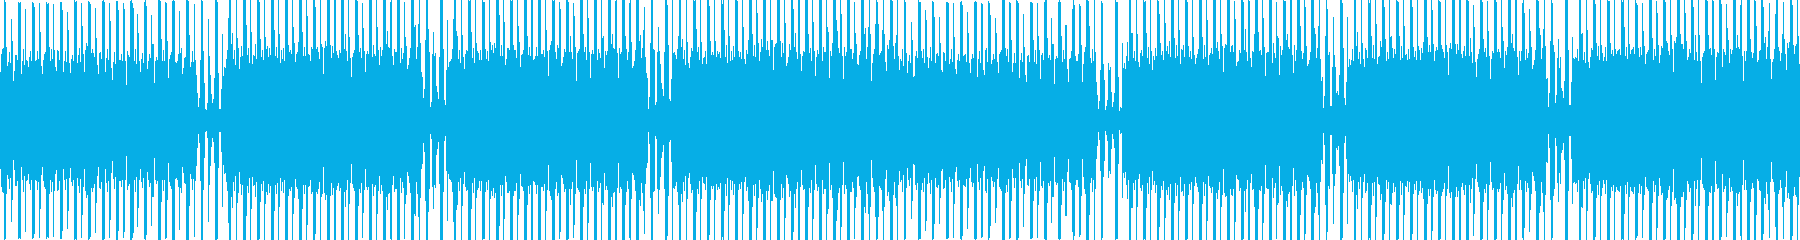 Loop仕様のテクノミュージックの再生済みの波形